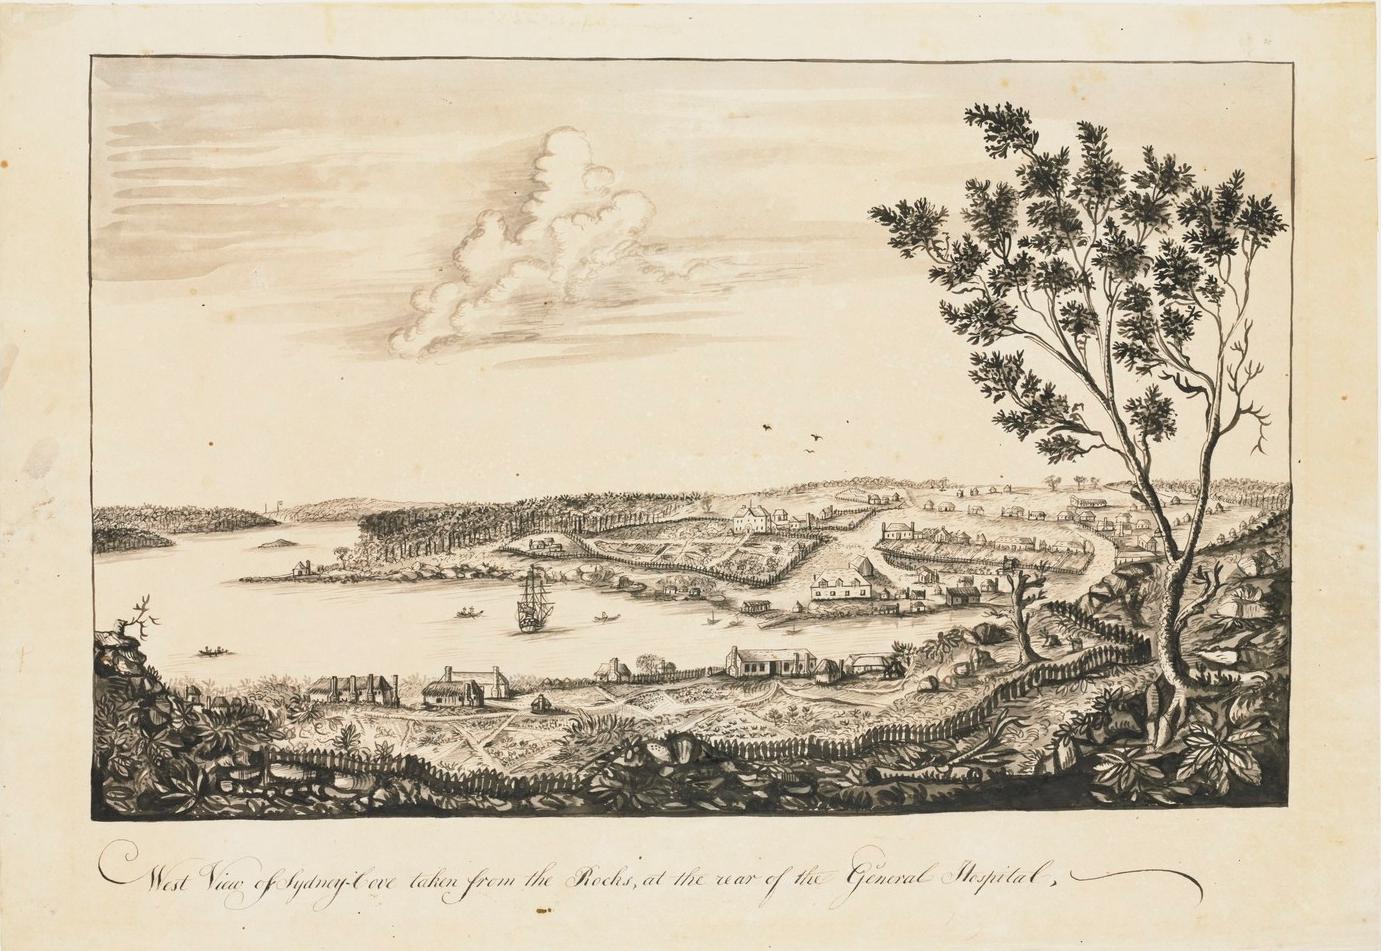 Sydney Cove, 1790, Second Fleet, Sydney, St. John's Cemetery Project, Old Parramattans